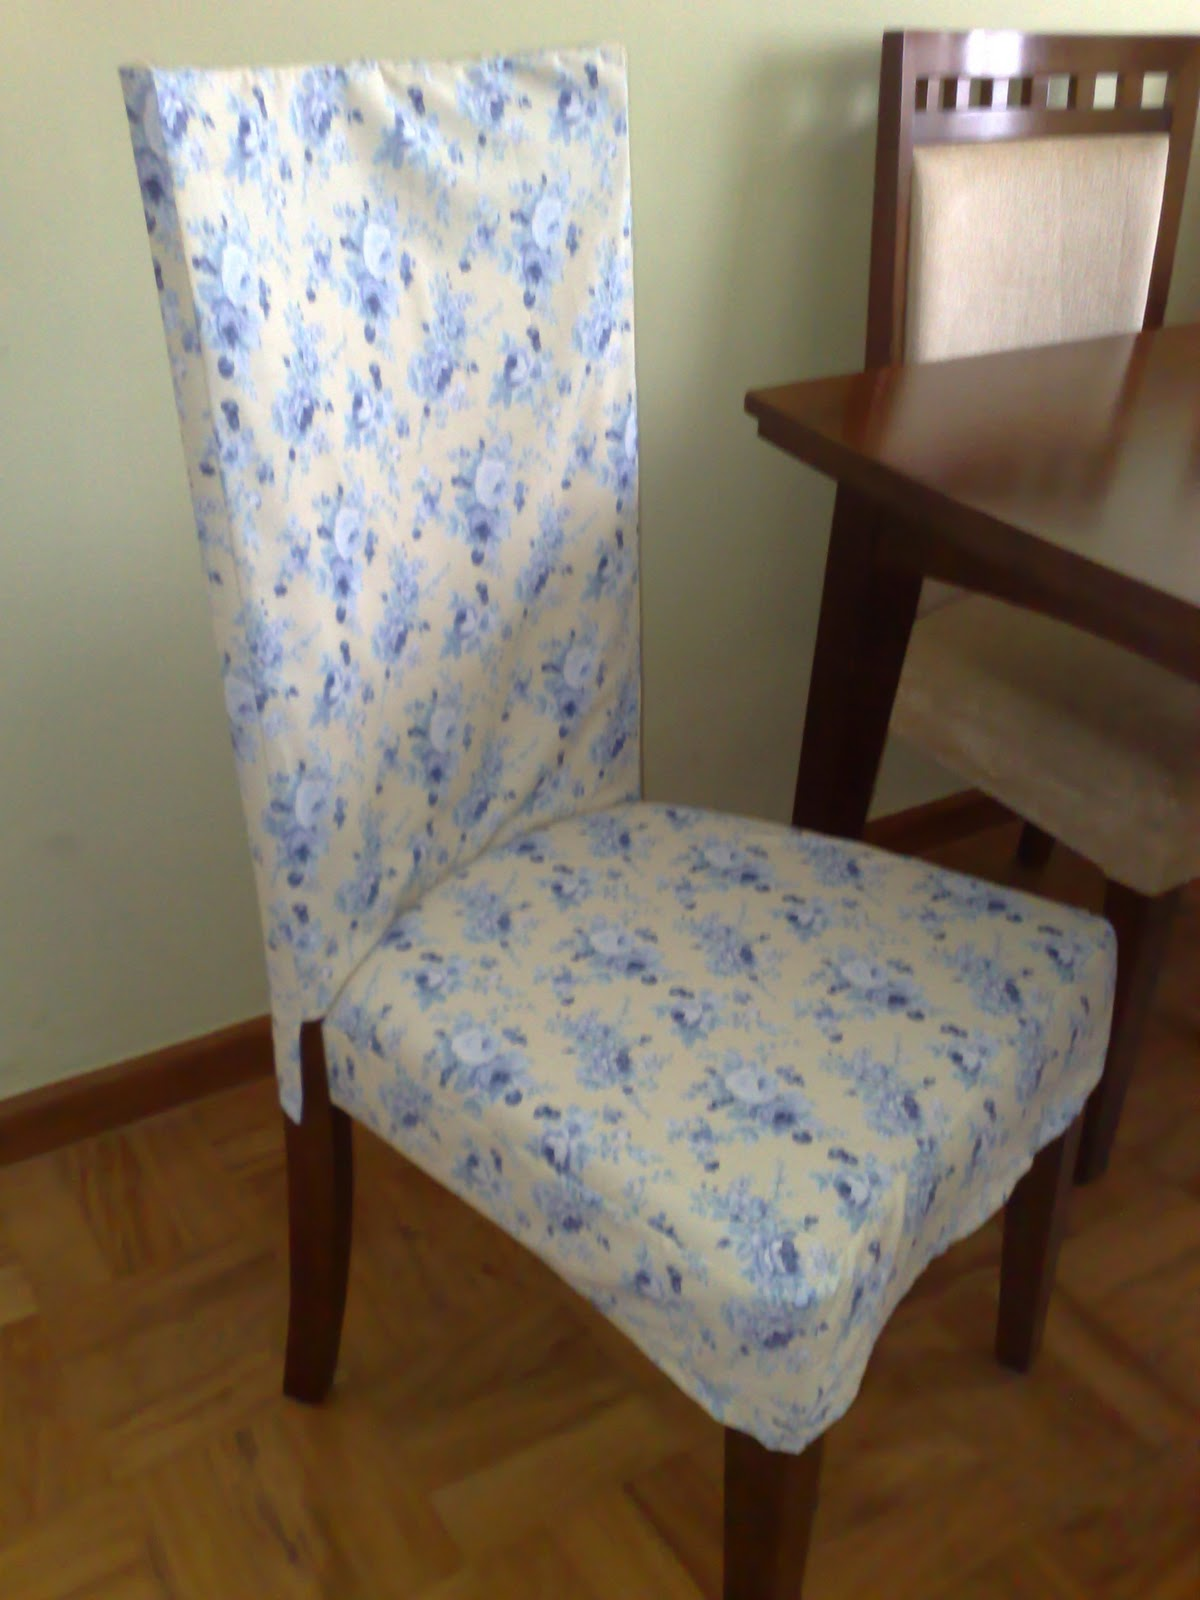 de 15 de novembro aproveitei para costurar capas para seis cadeiras  #402714 1200x1600